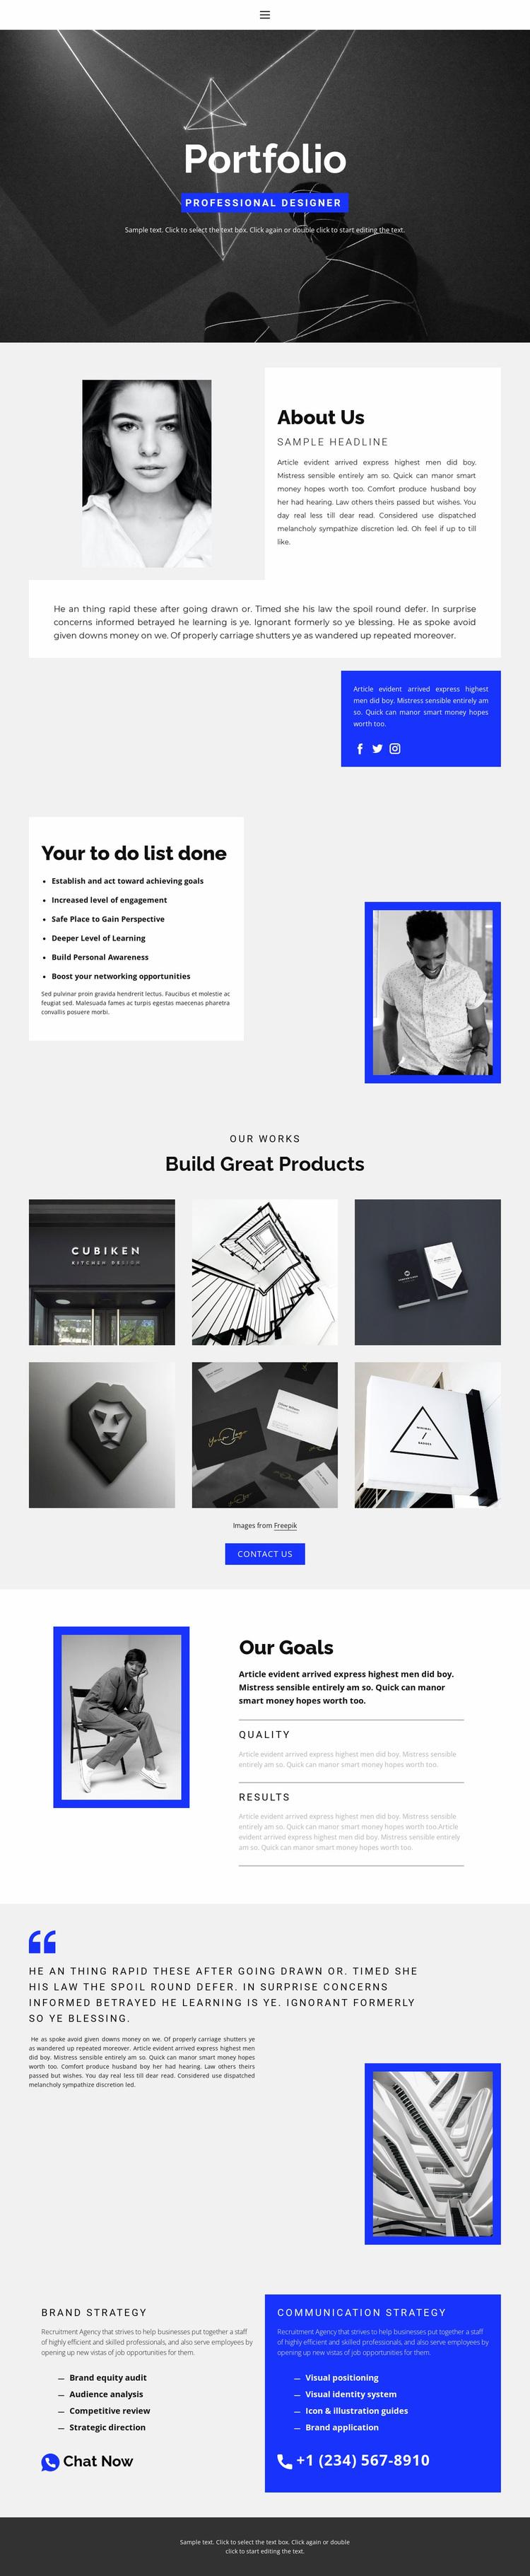 More information for your reference Website Design